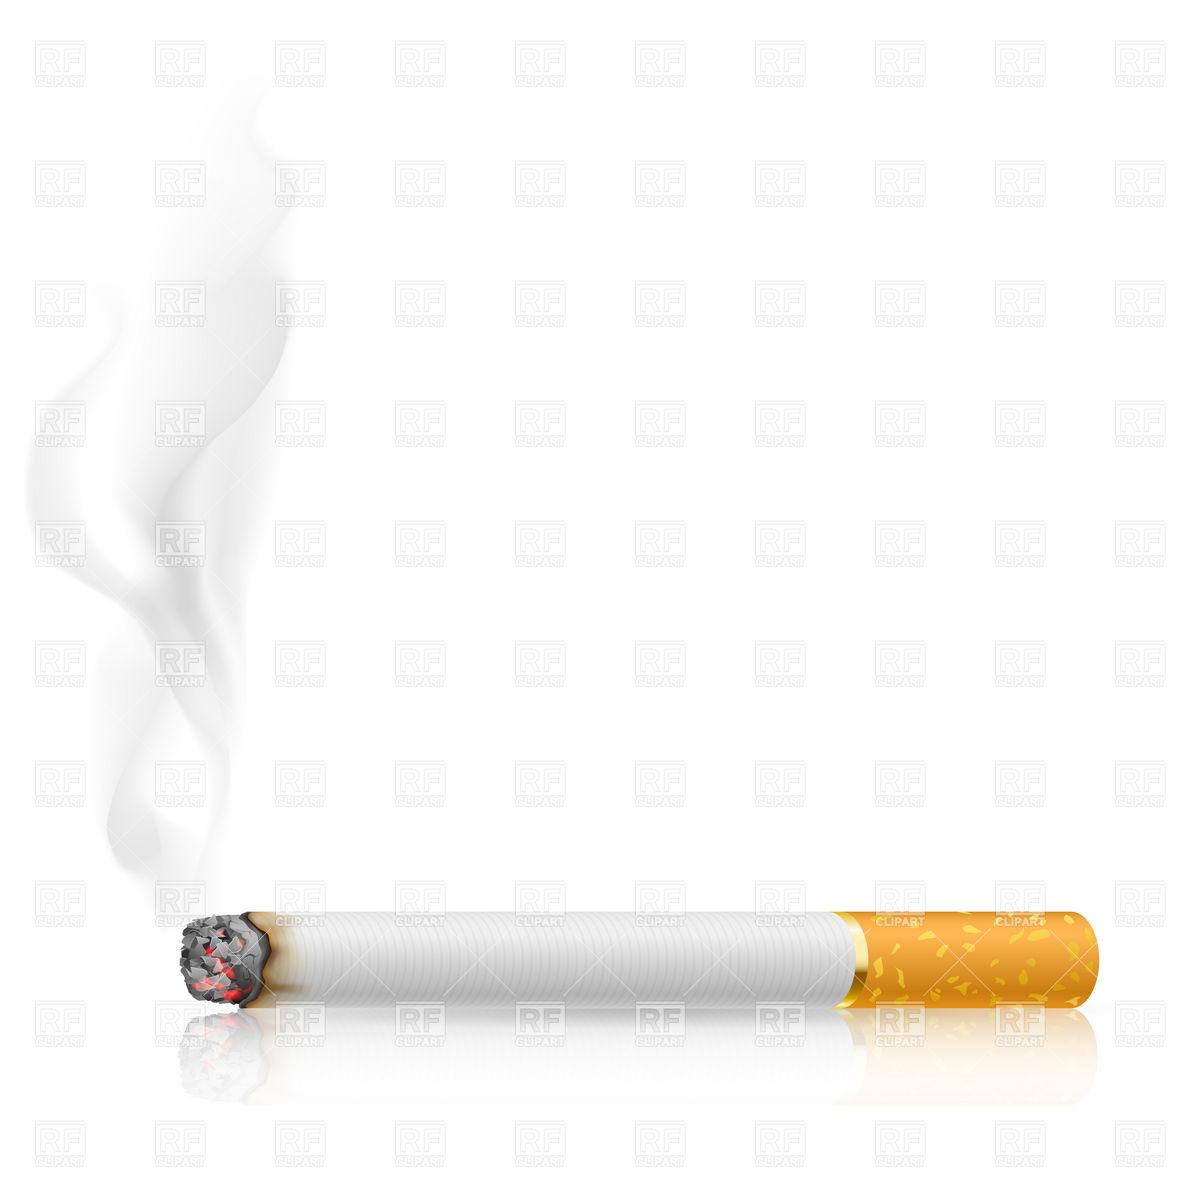 Clothes Of Cigarette Smoke In Clipart.